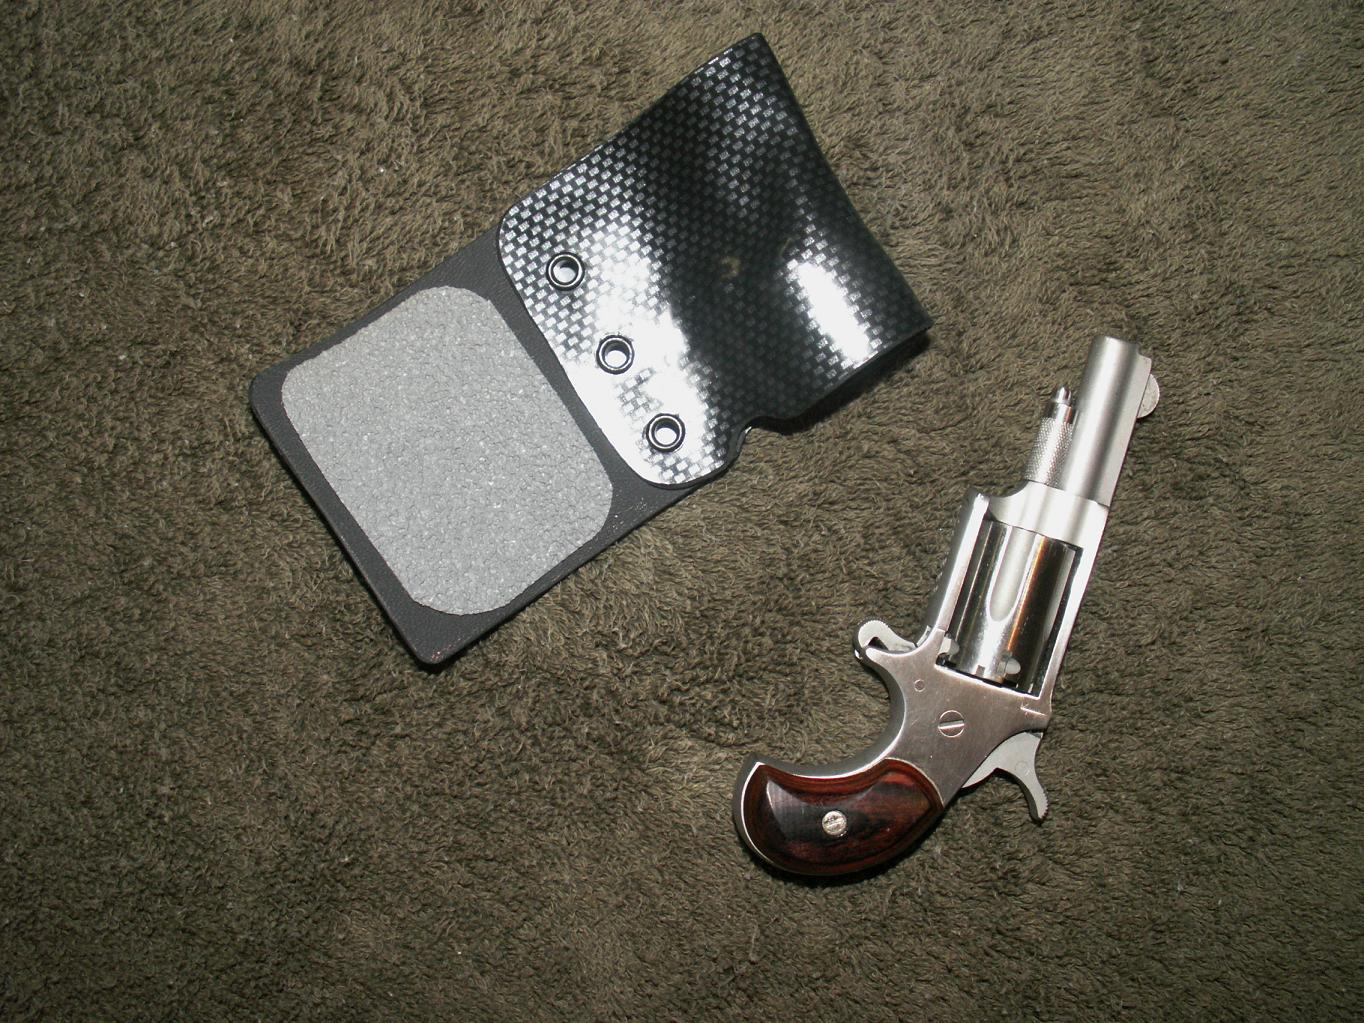 Anyone carry a .22 revolver?-kydex-naa-pocket-holster-006.jpg